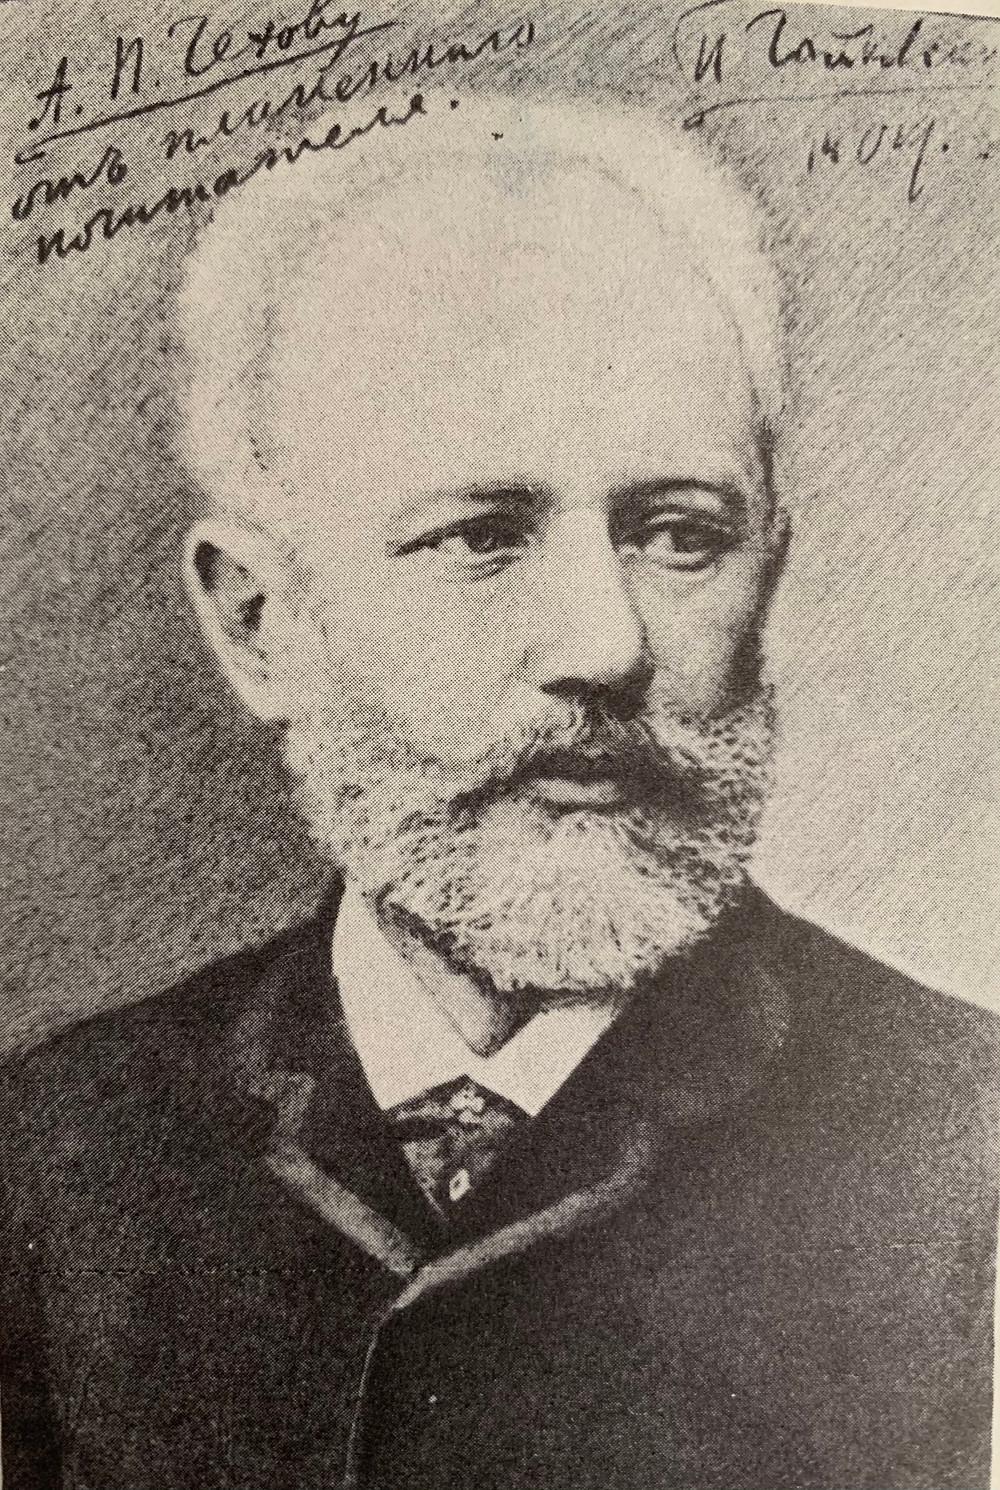 P. I. Tchaikovsky compositor ruso